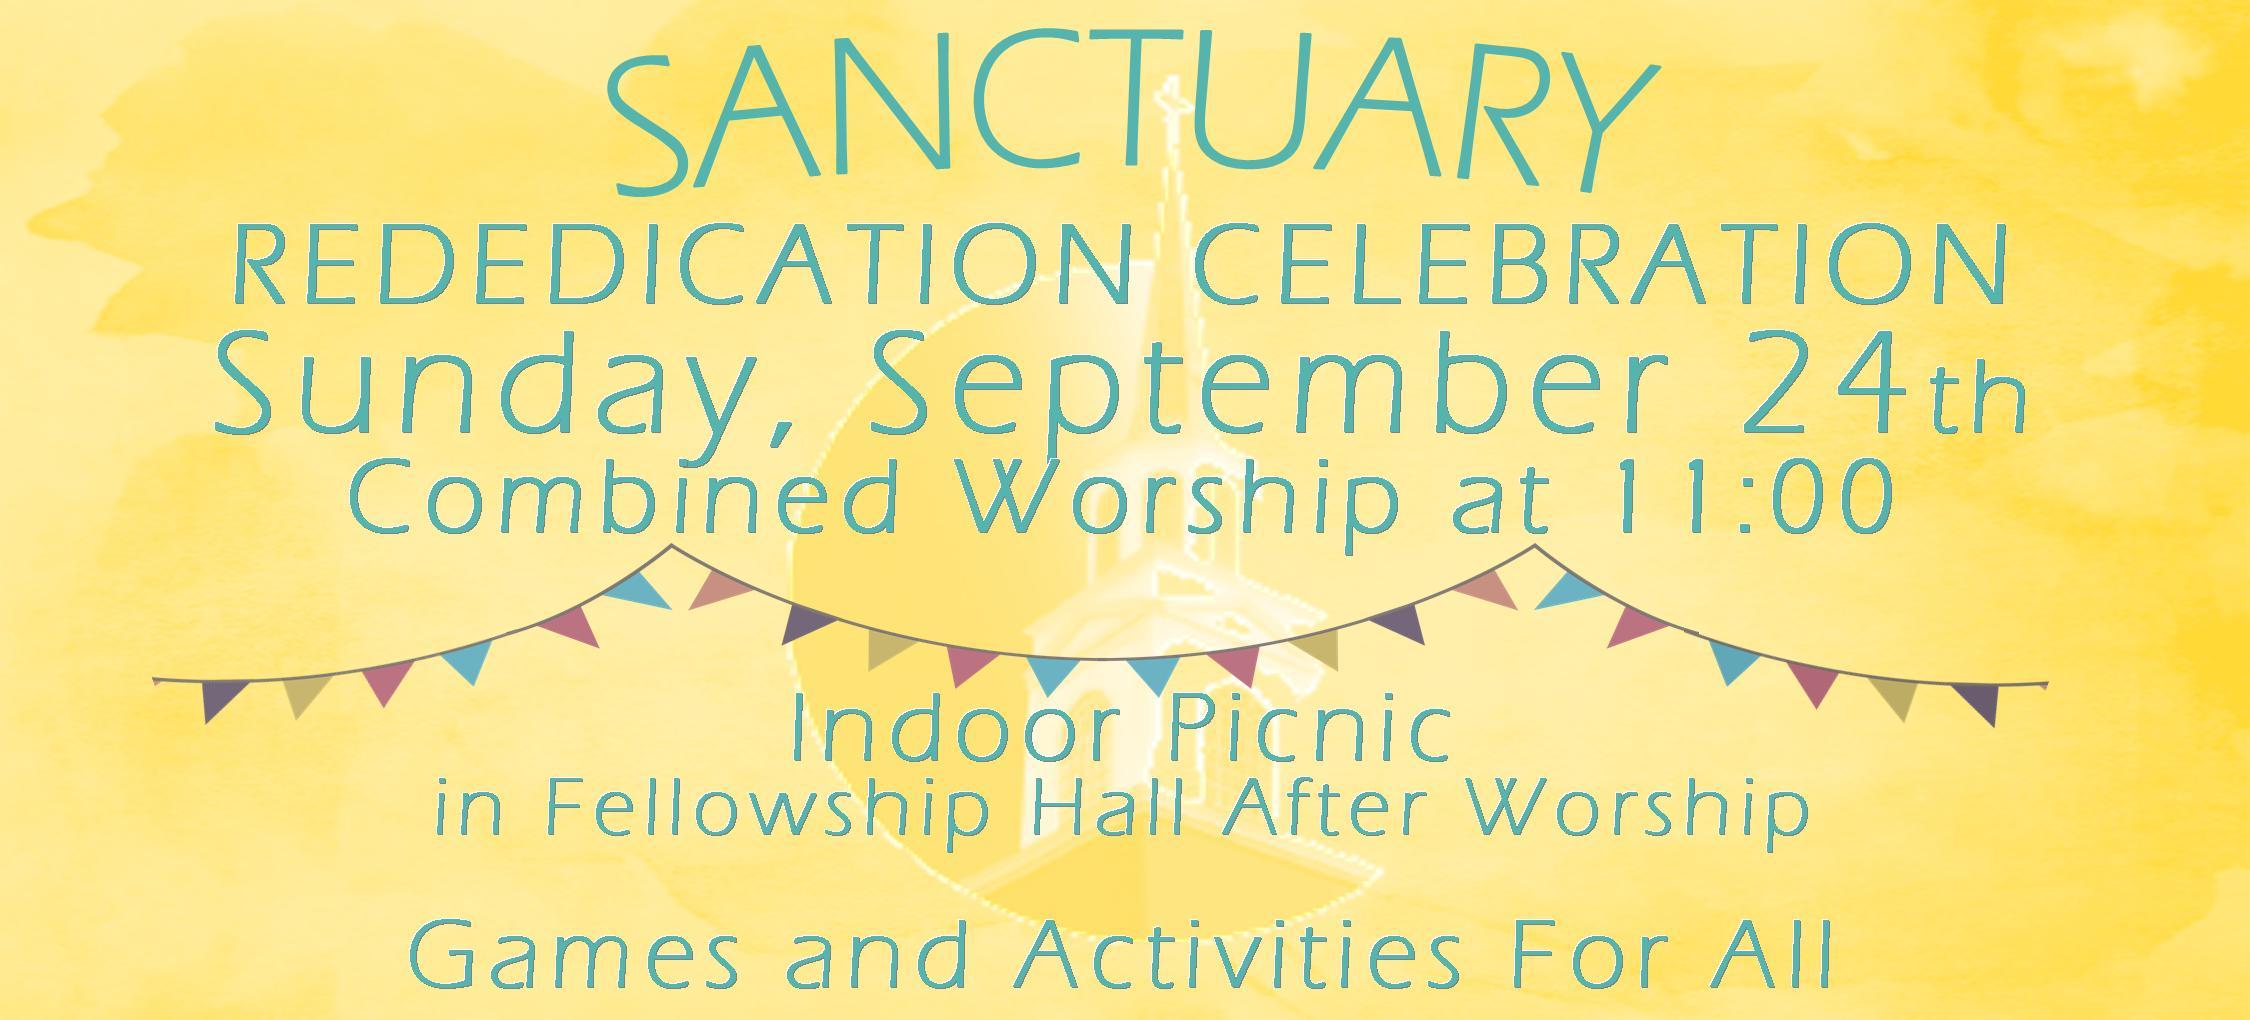 Rededication Sanctuary Slider Rev 091517.jpg